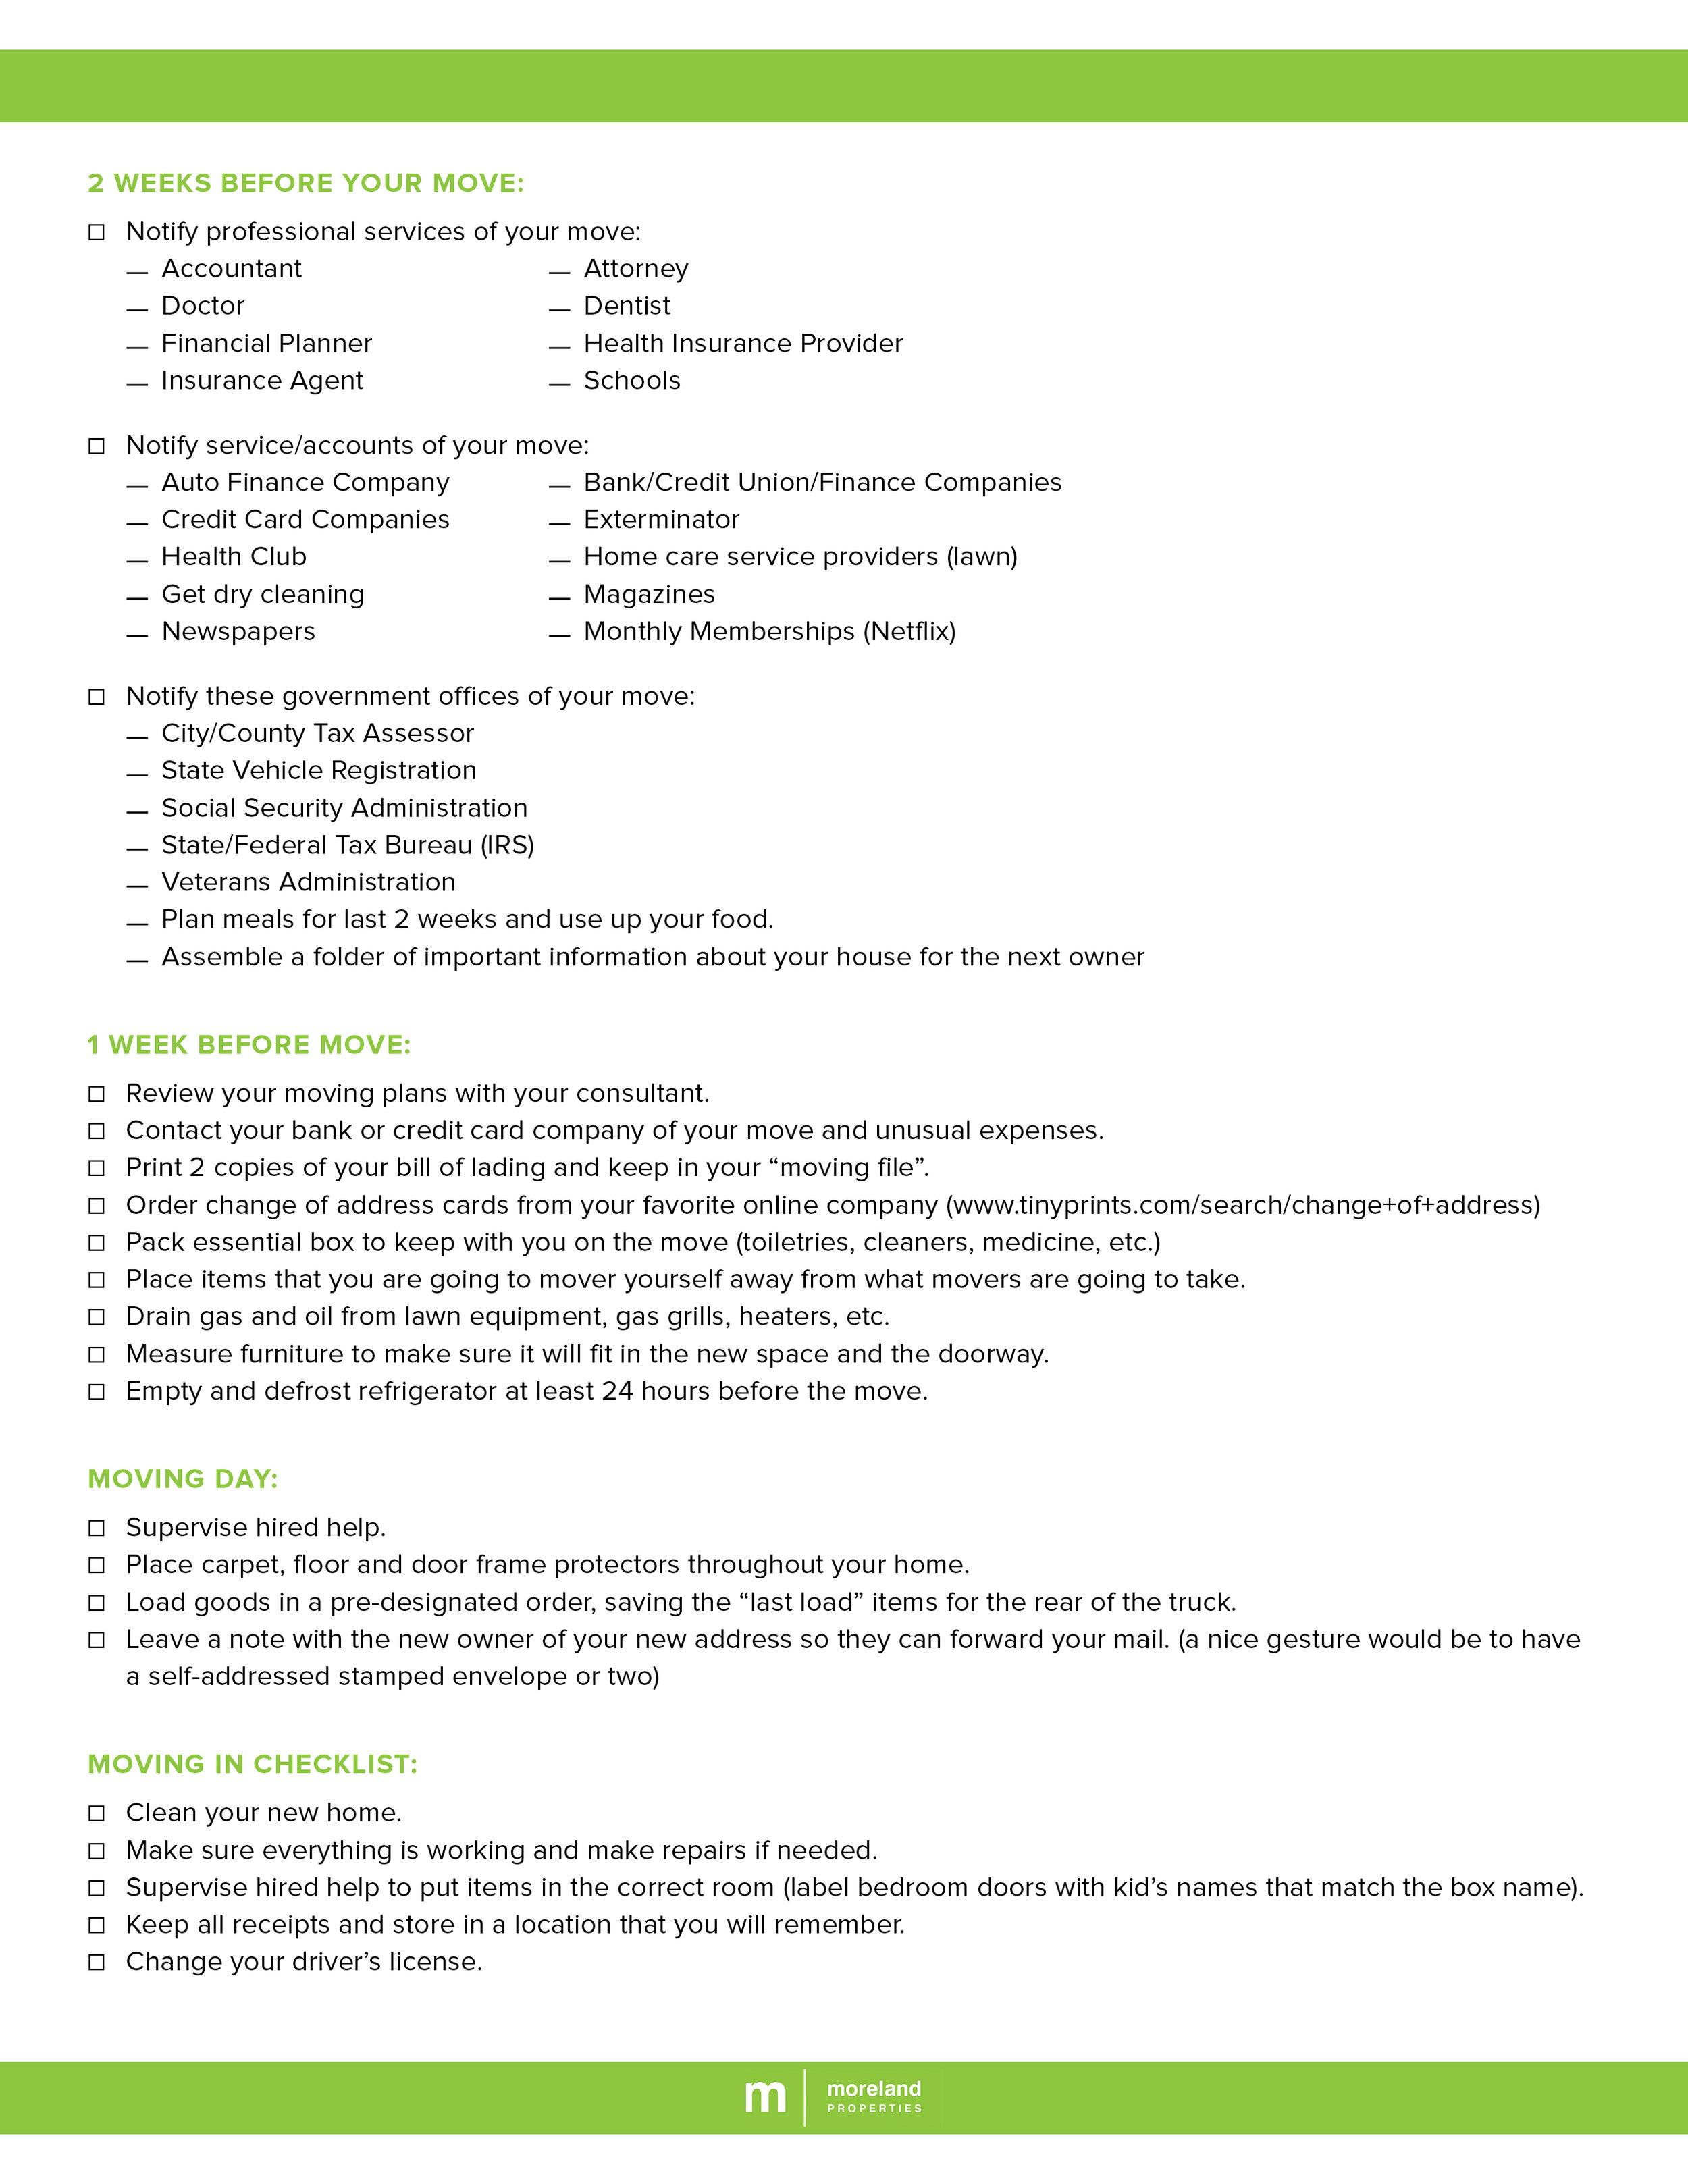 Moving Checklist Local2.jpg